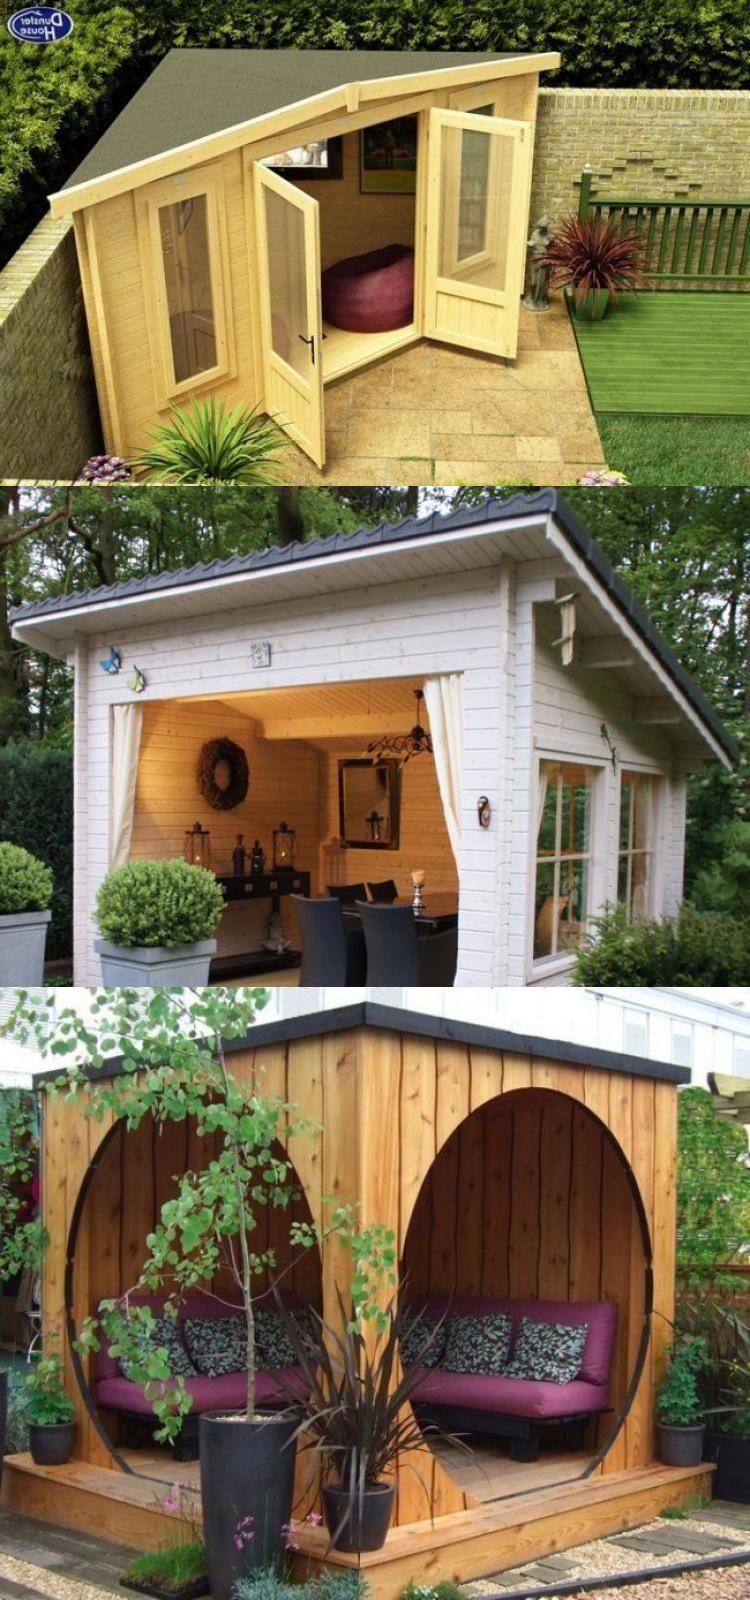 20 Adorable Outdoor Gazebo Design Beautiful Improvement For Your Home Diy Gazebo Backyard Landscaping Designs Diy Backyard